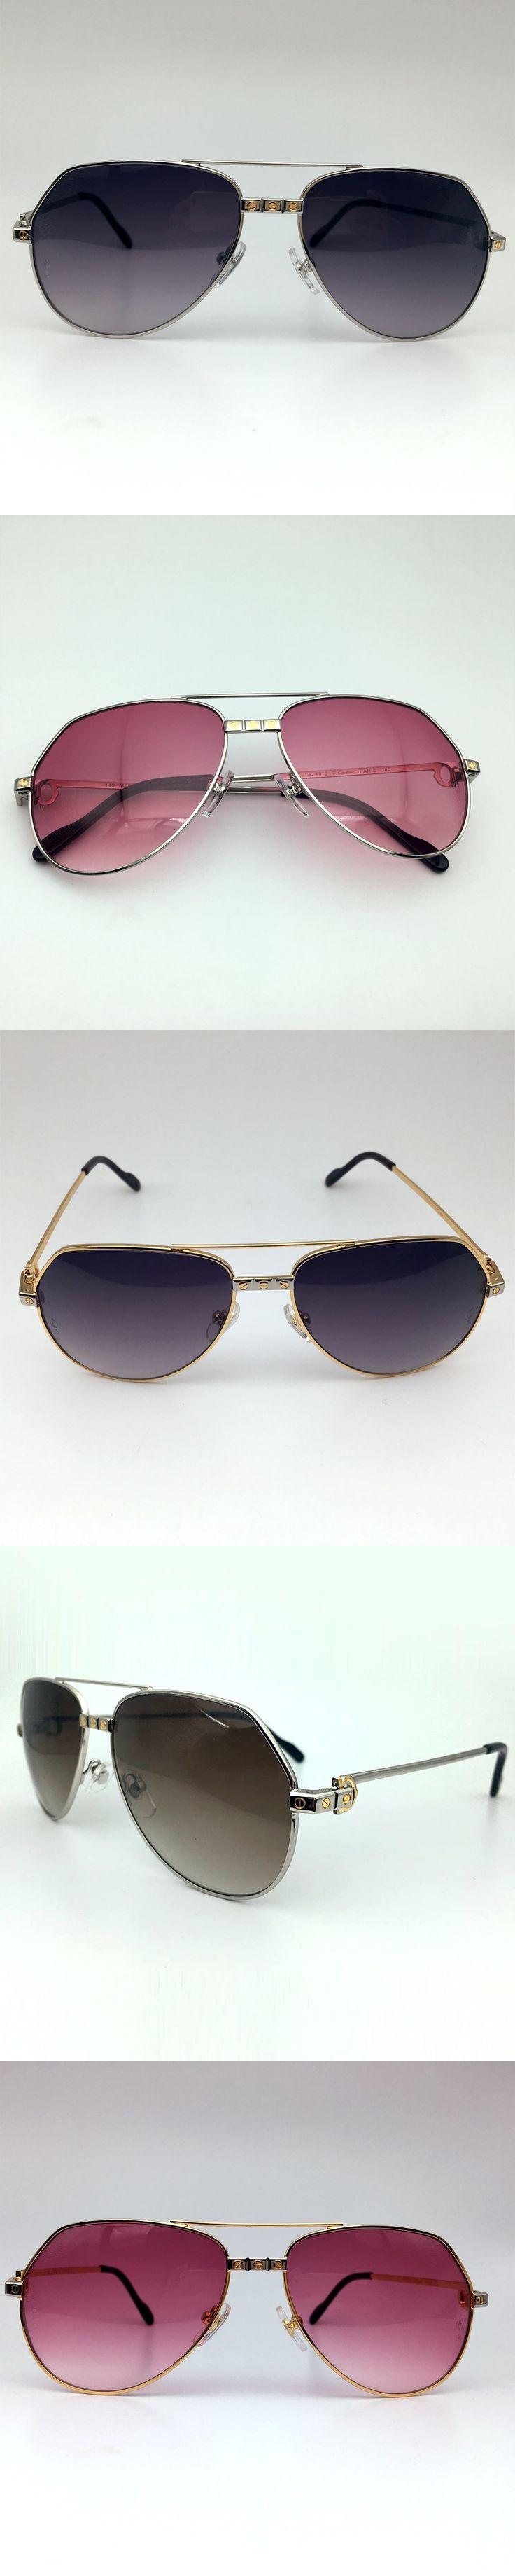 LAOKE Aviator sunglasses men metal sun glass frame Carter glasses women designer brand fashion pilot sunglass vintage for mens